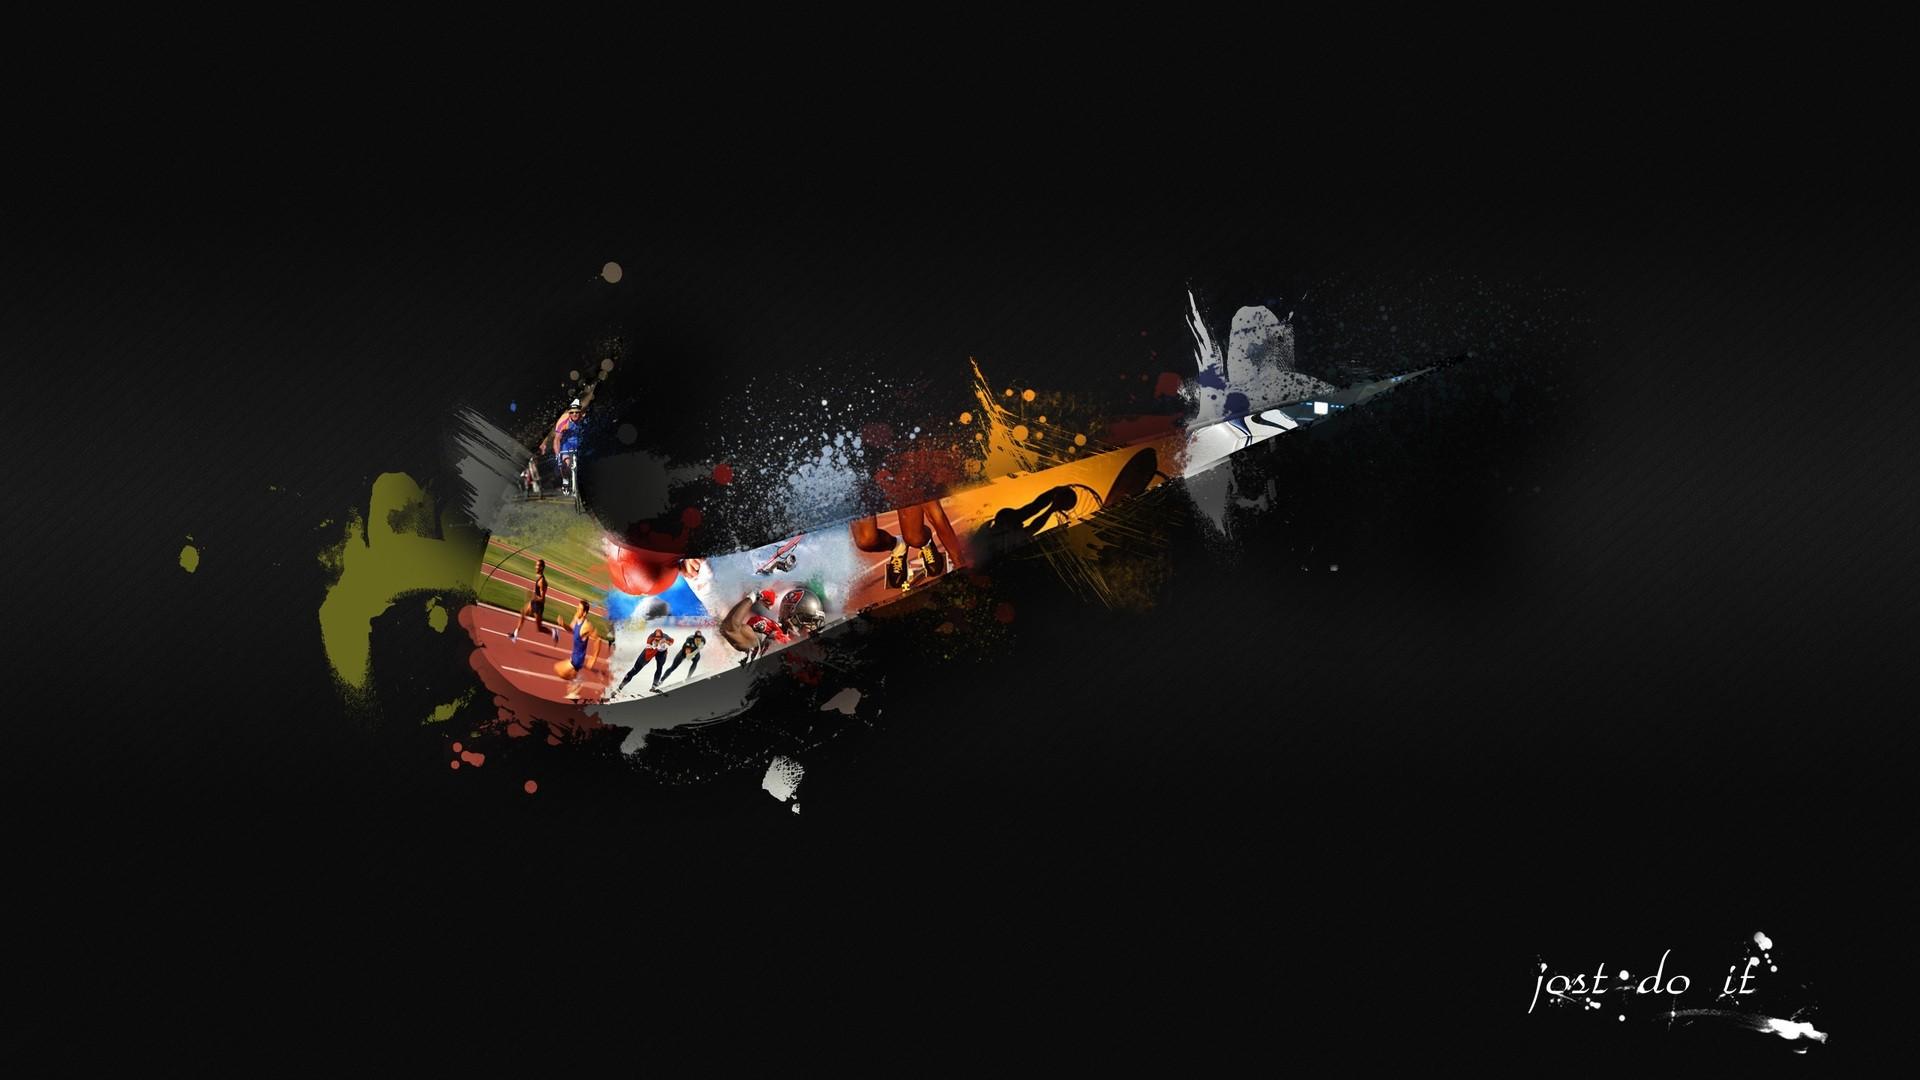 abstract Nike digital art artwork brands black background 1920x1080